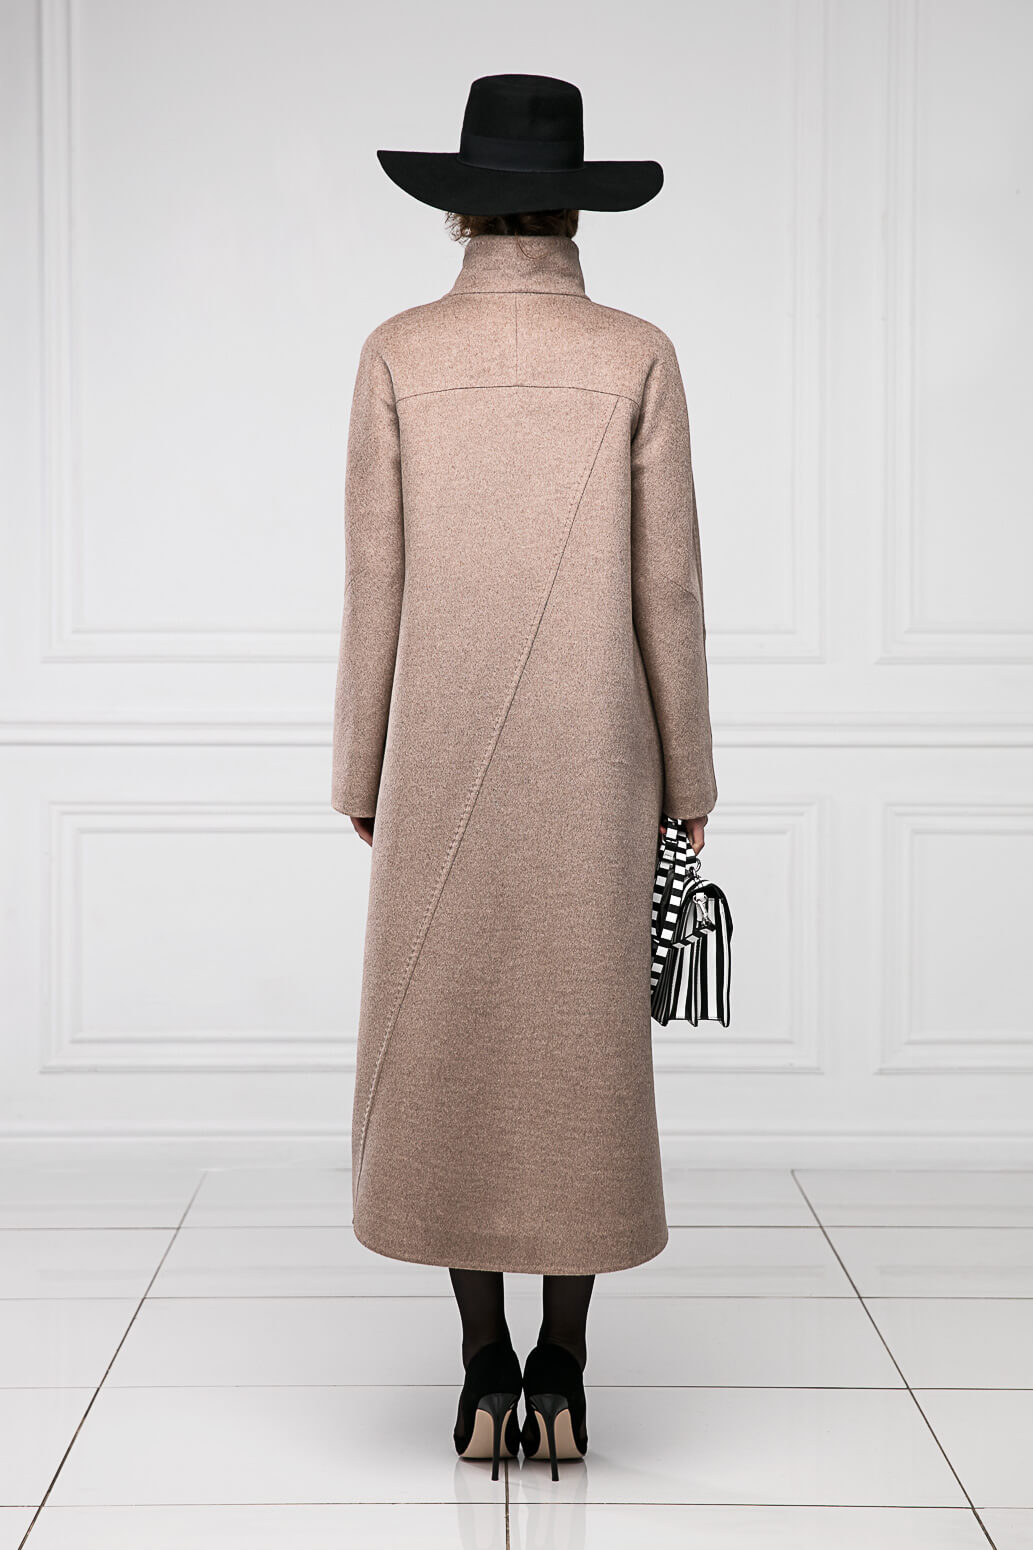 Съемка пальто для производителя